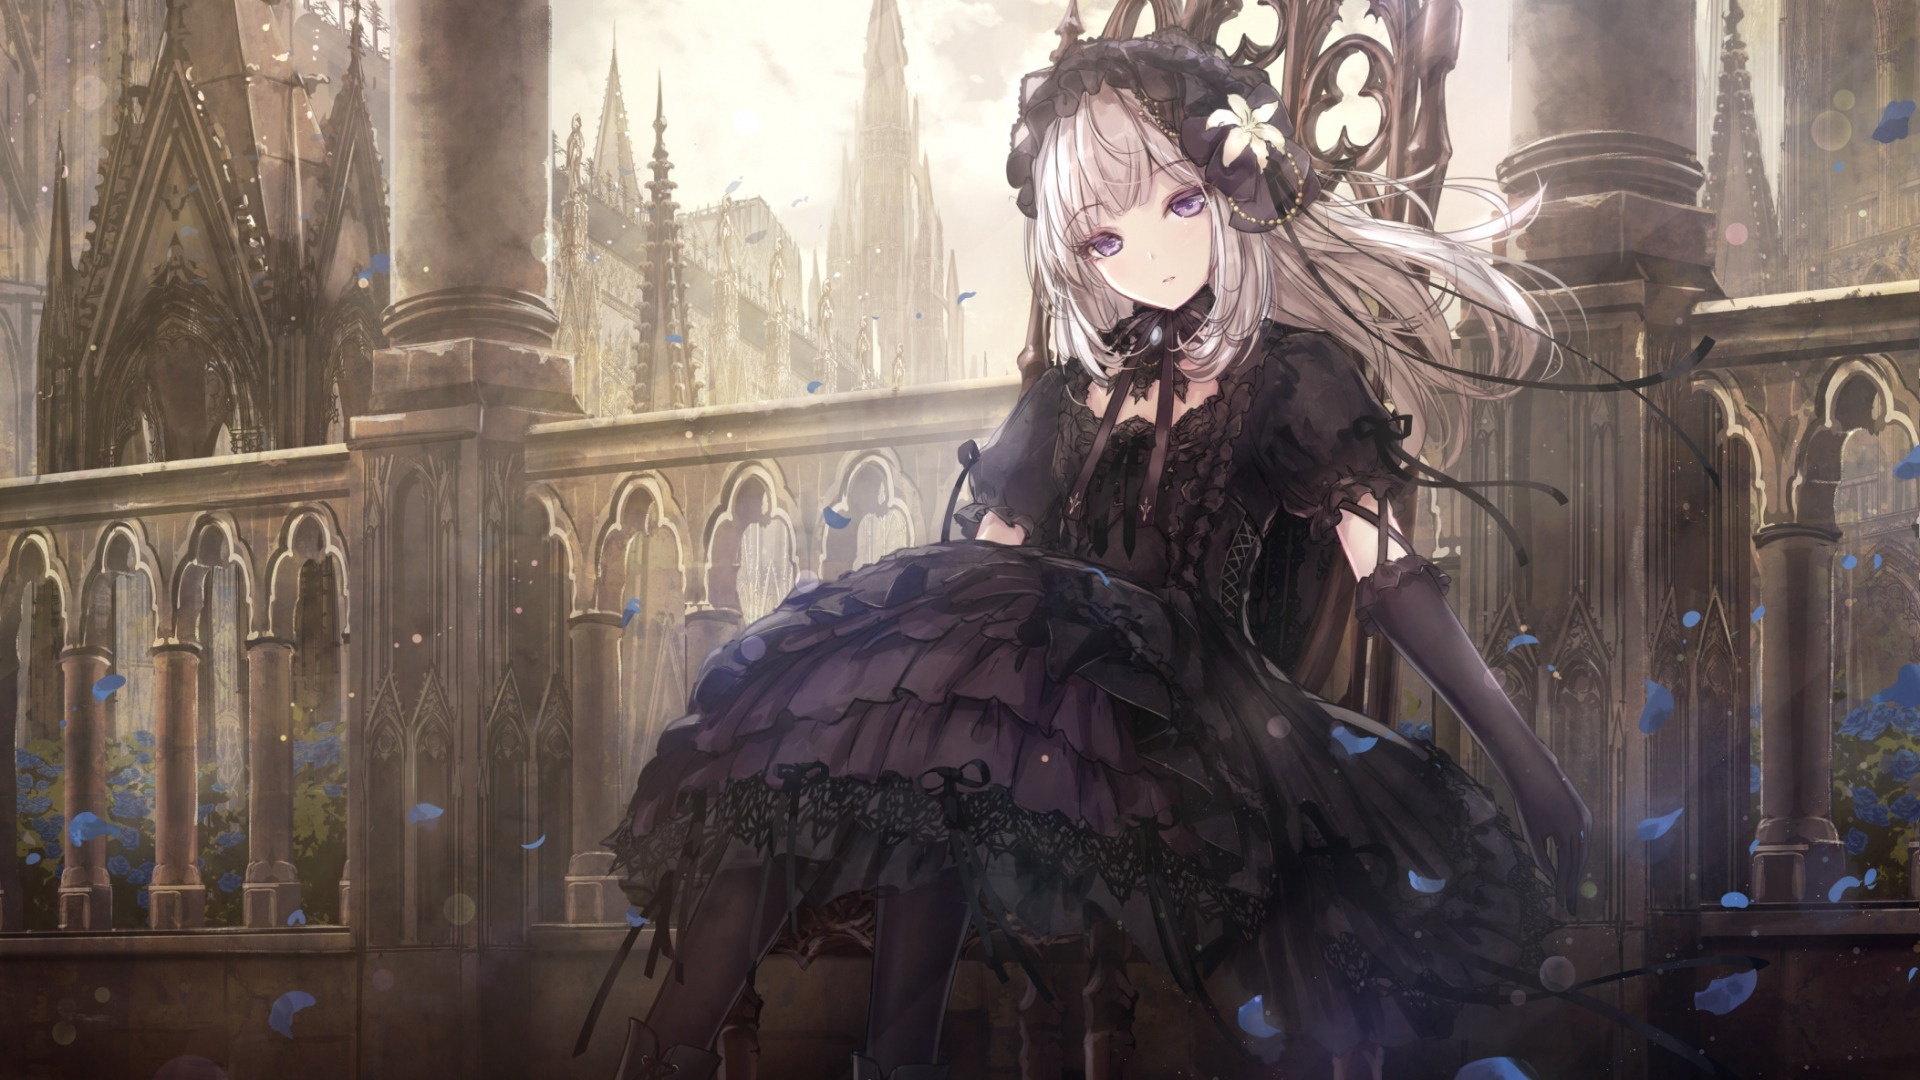 Anime Gothic Girl cool wallpaper